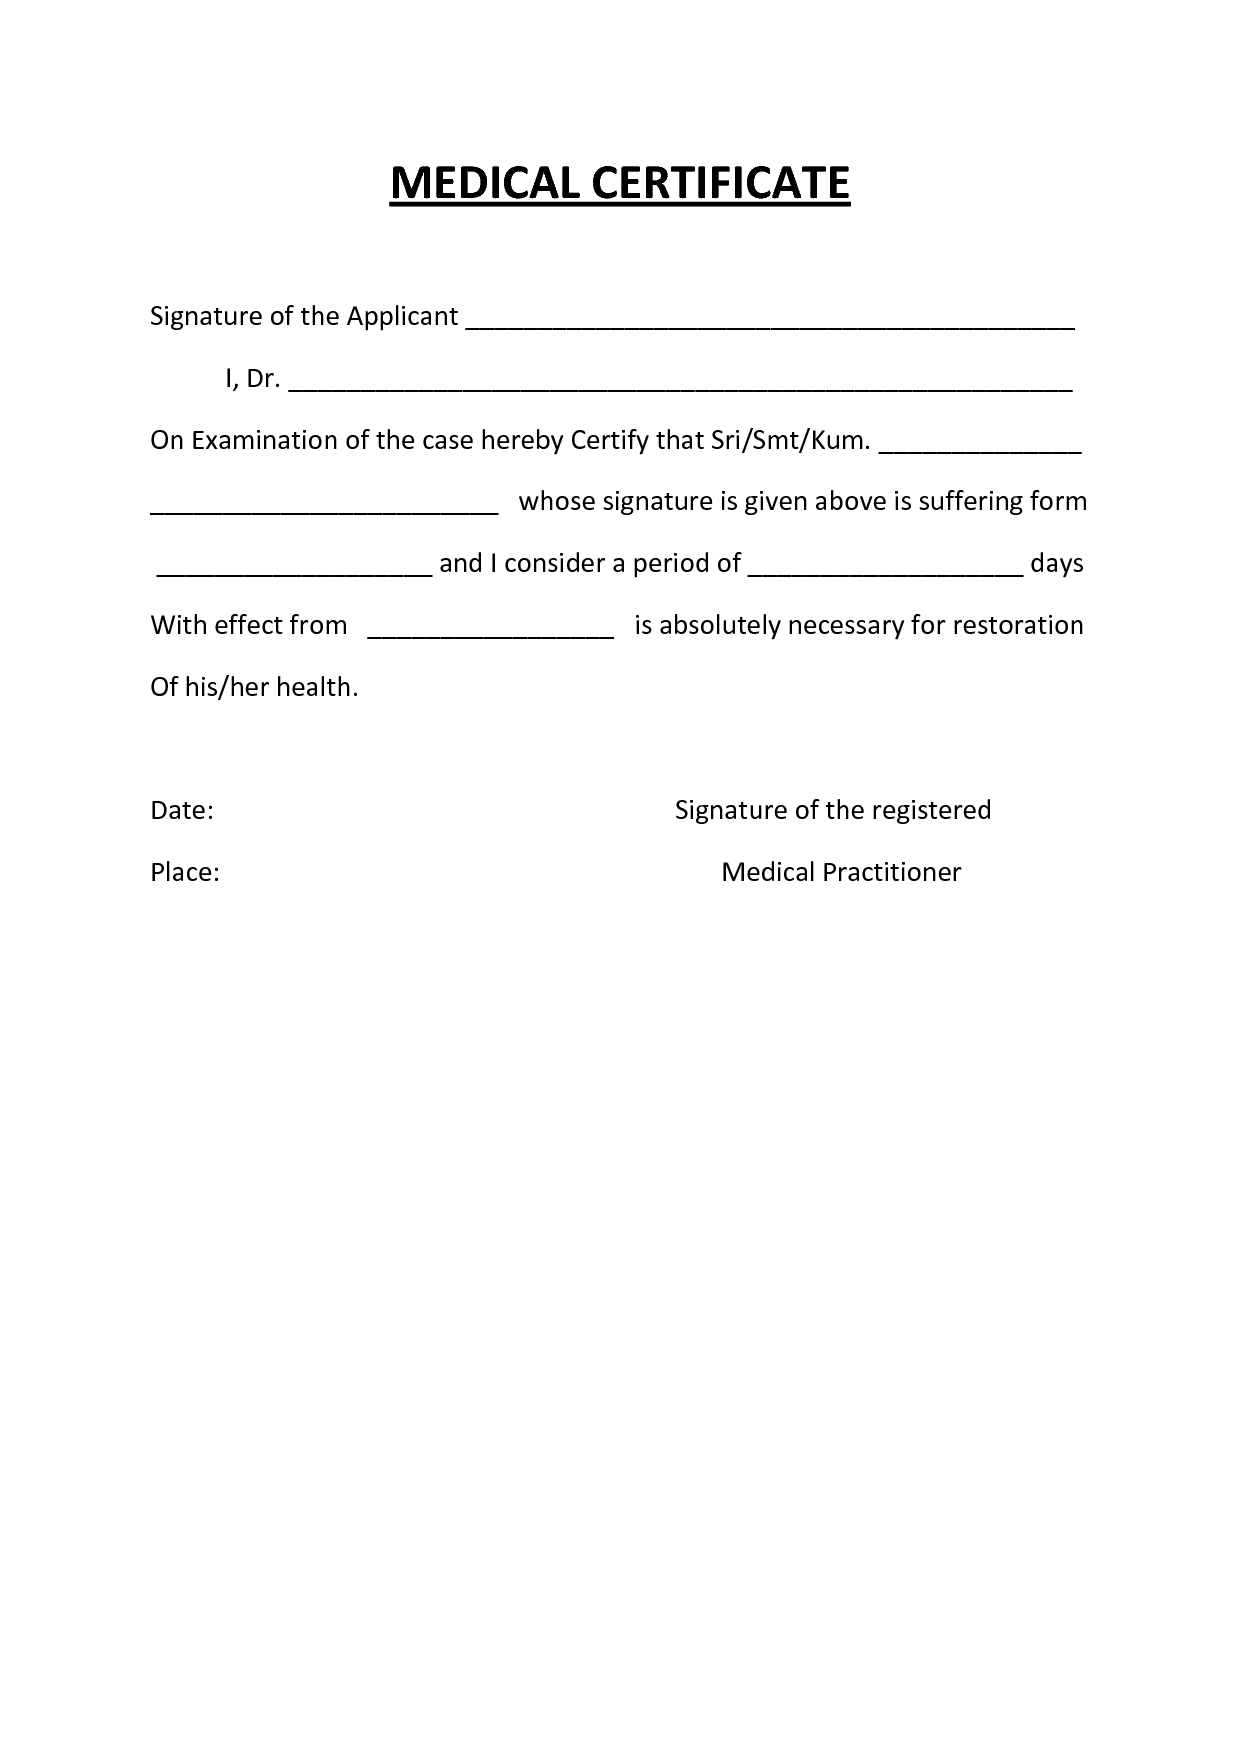 Australian Doctors Certificate Template - Atlantaauctionco Inside Australian Doctors Certificate Template